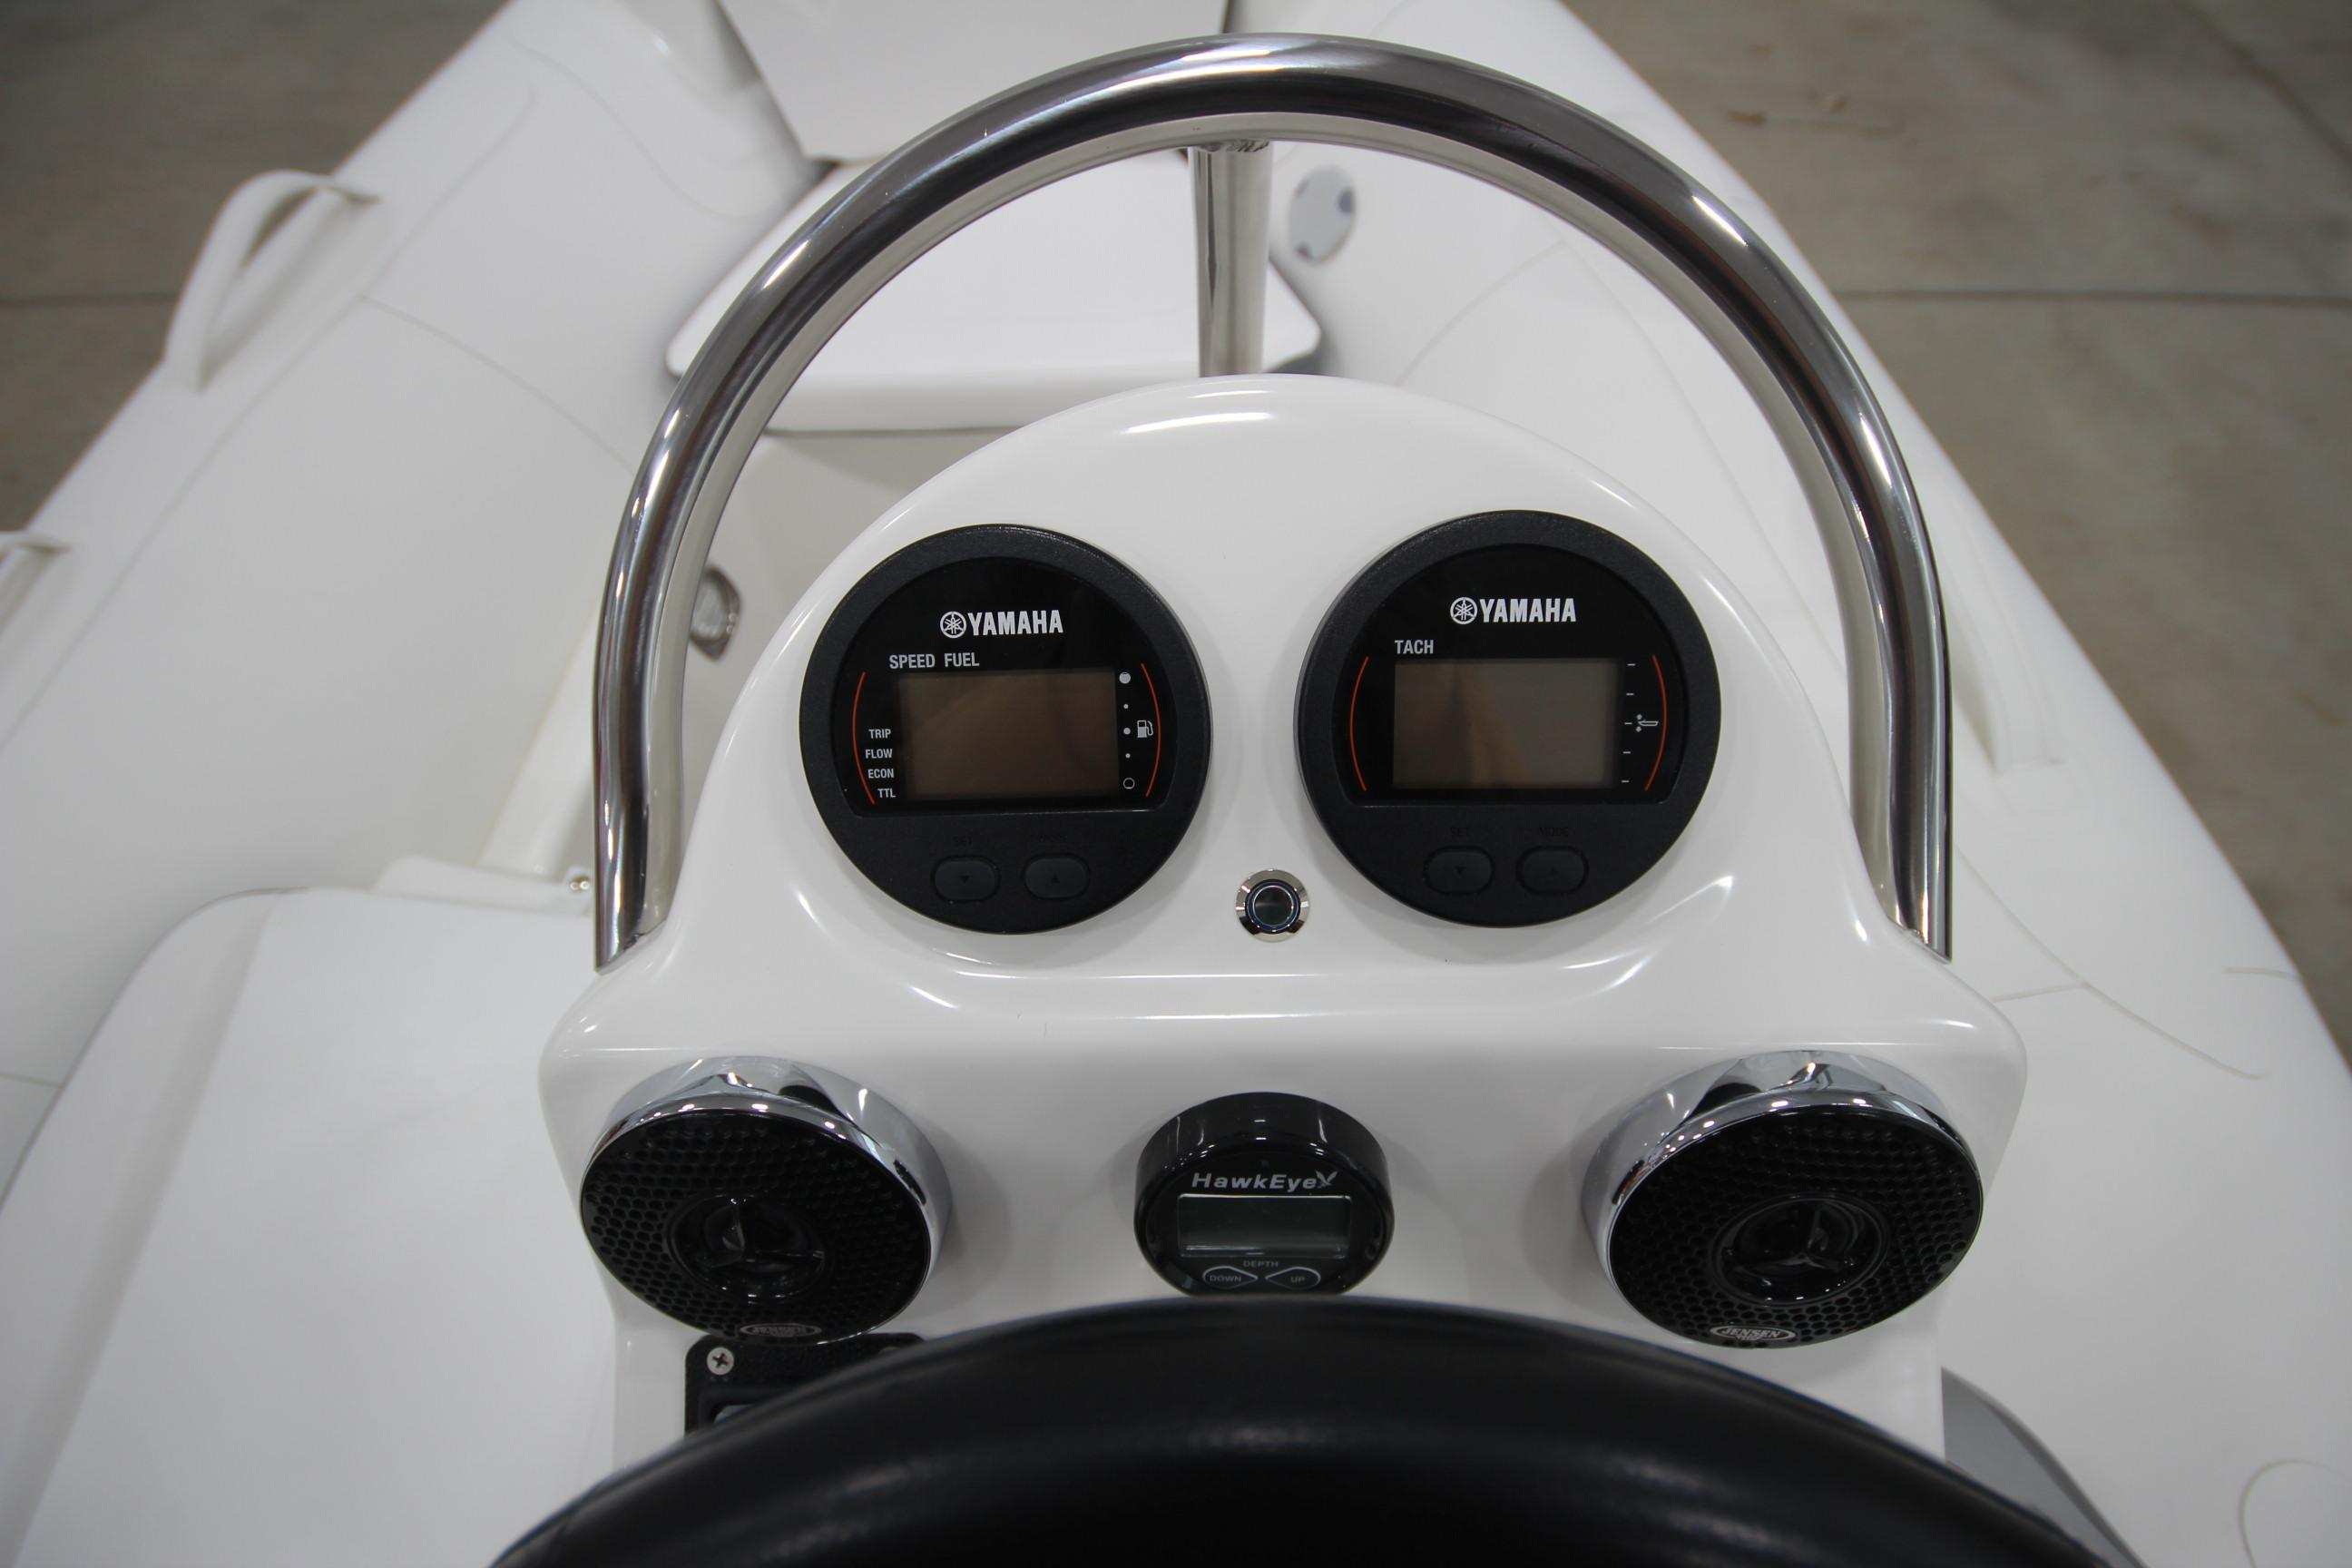 2021 Zodiac Yachtline 400 Deluxe NEO GL Edition 50hp In Stock, Image 18